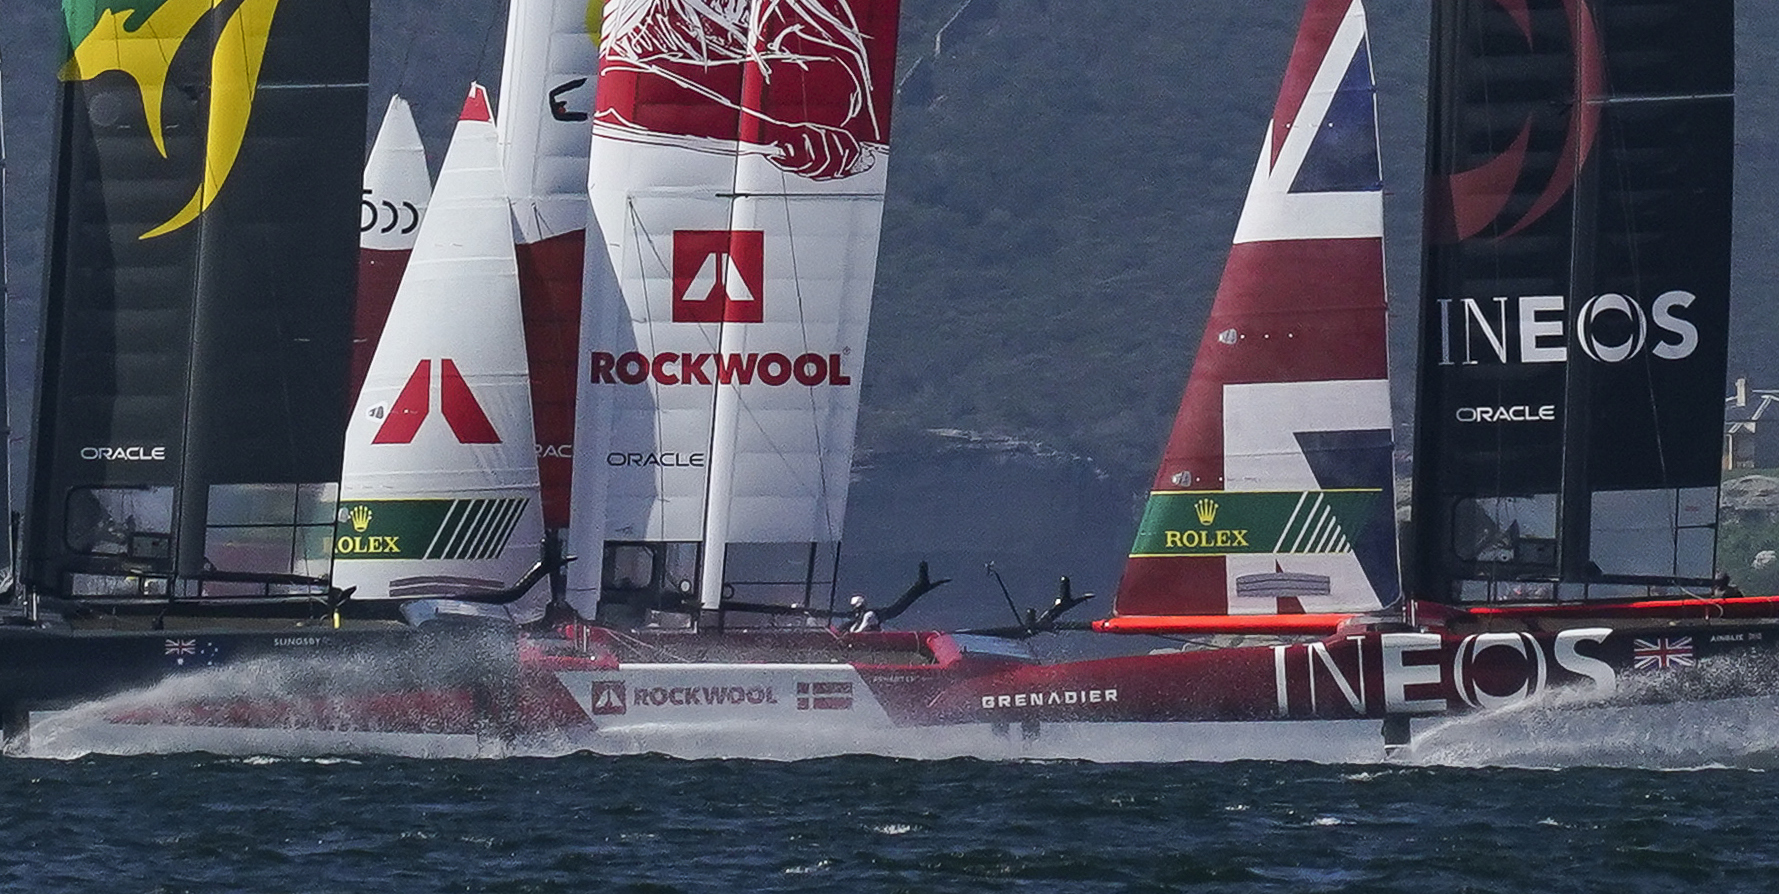 SailGP F50 catamarans racing head to head